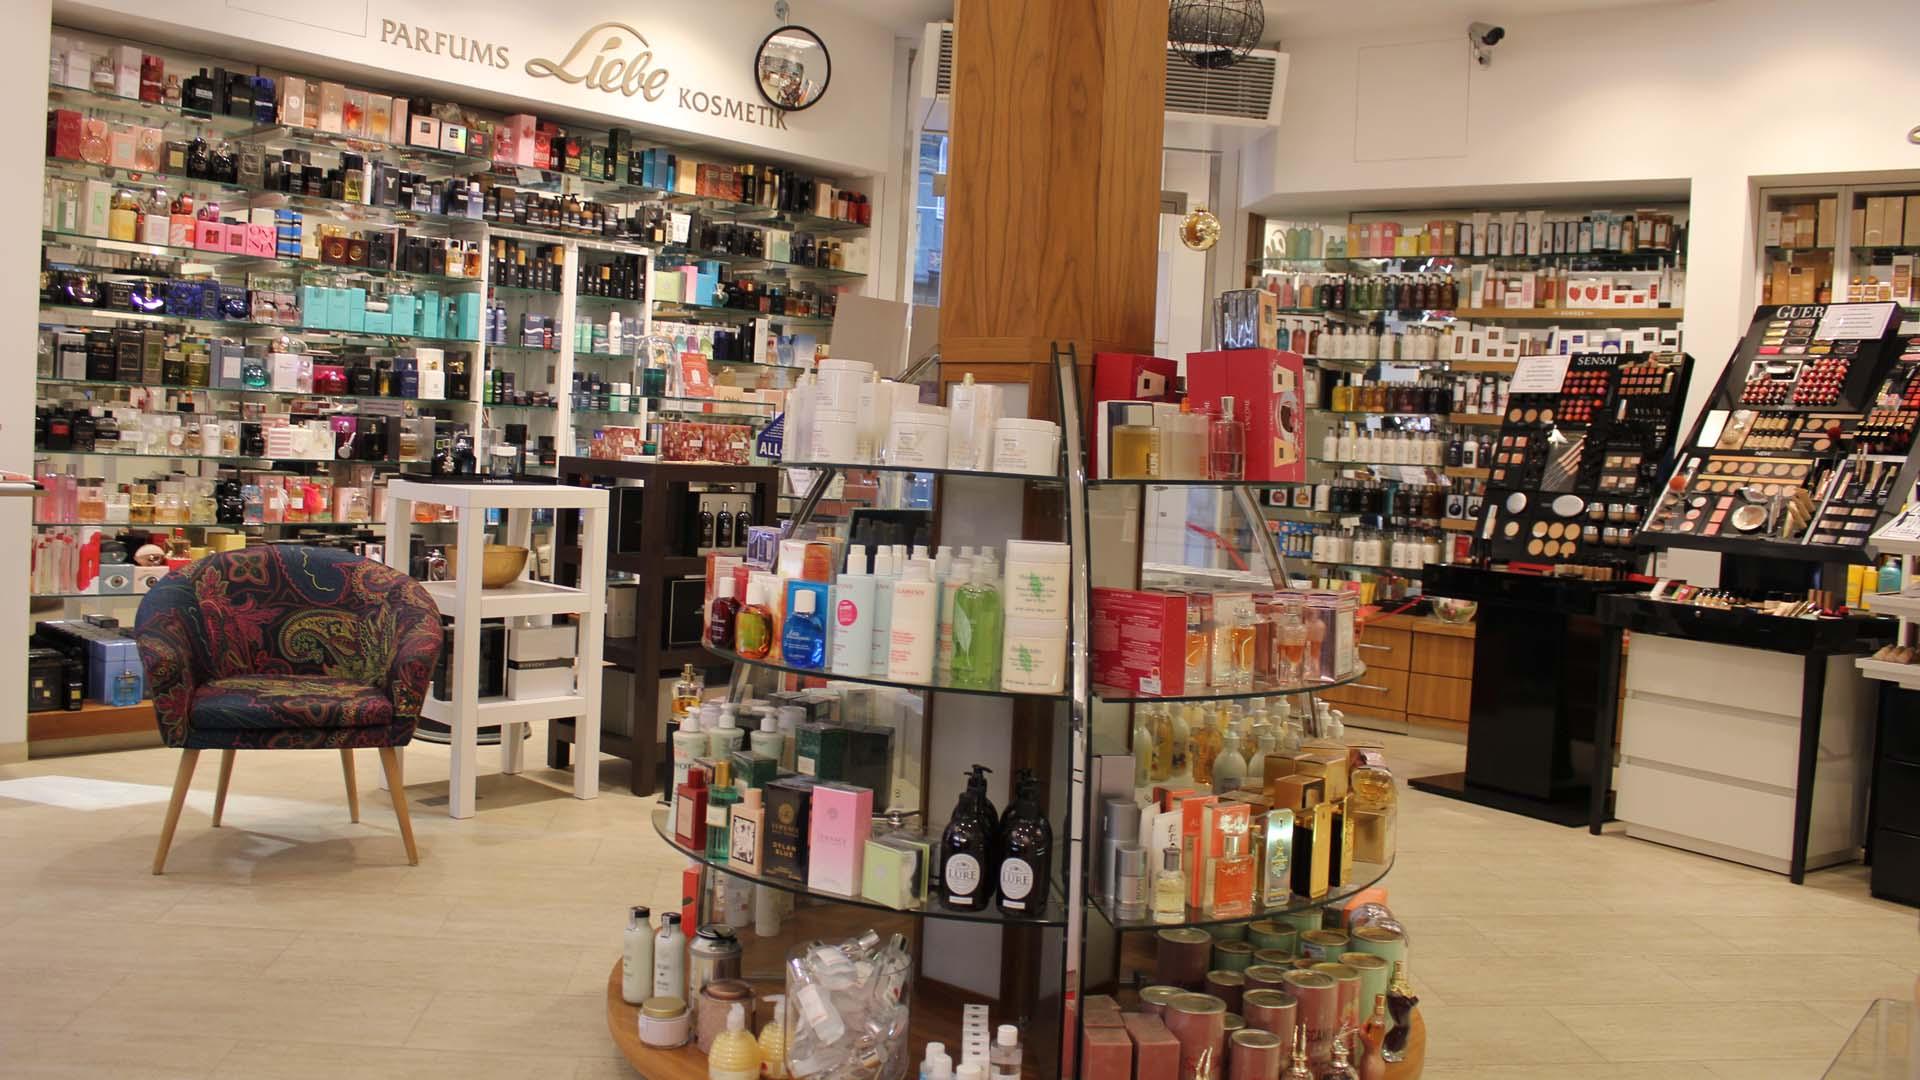 celle-parfums-kosmetik-liebe-10.jpg